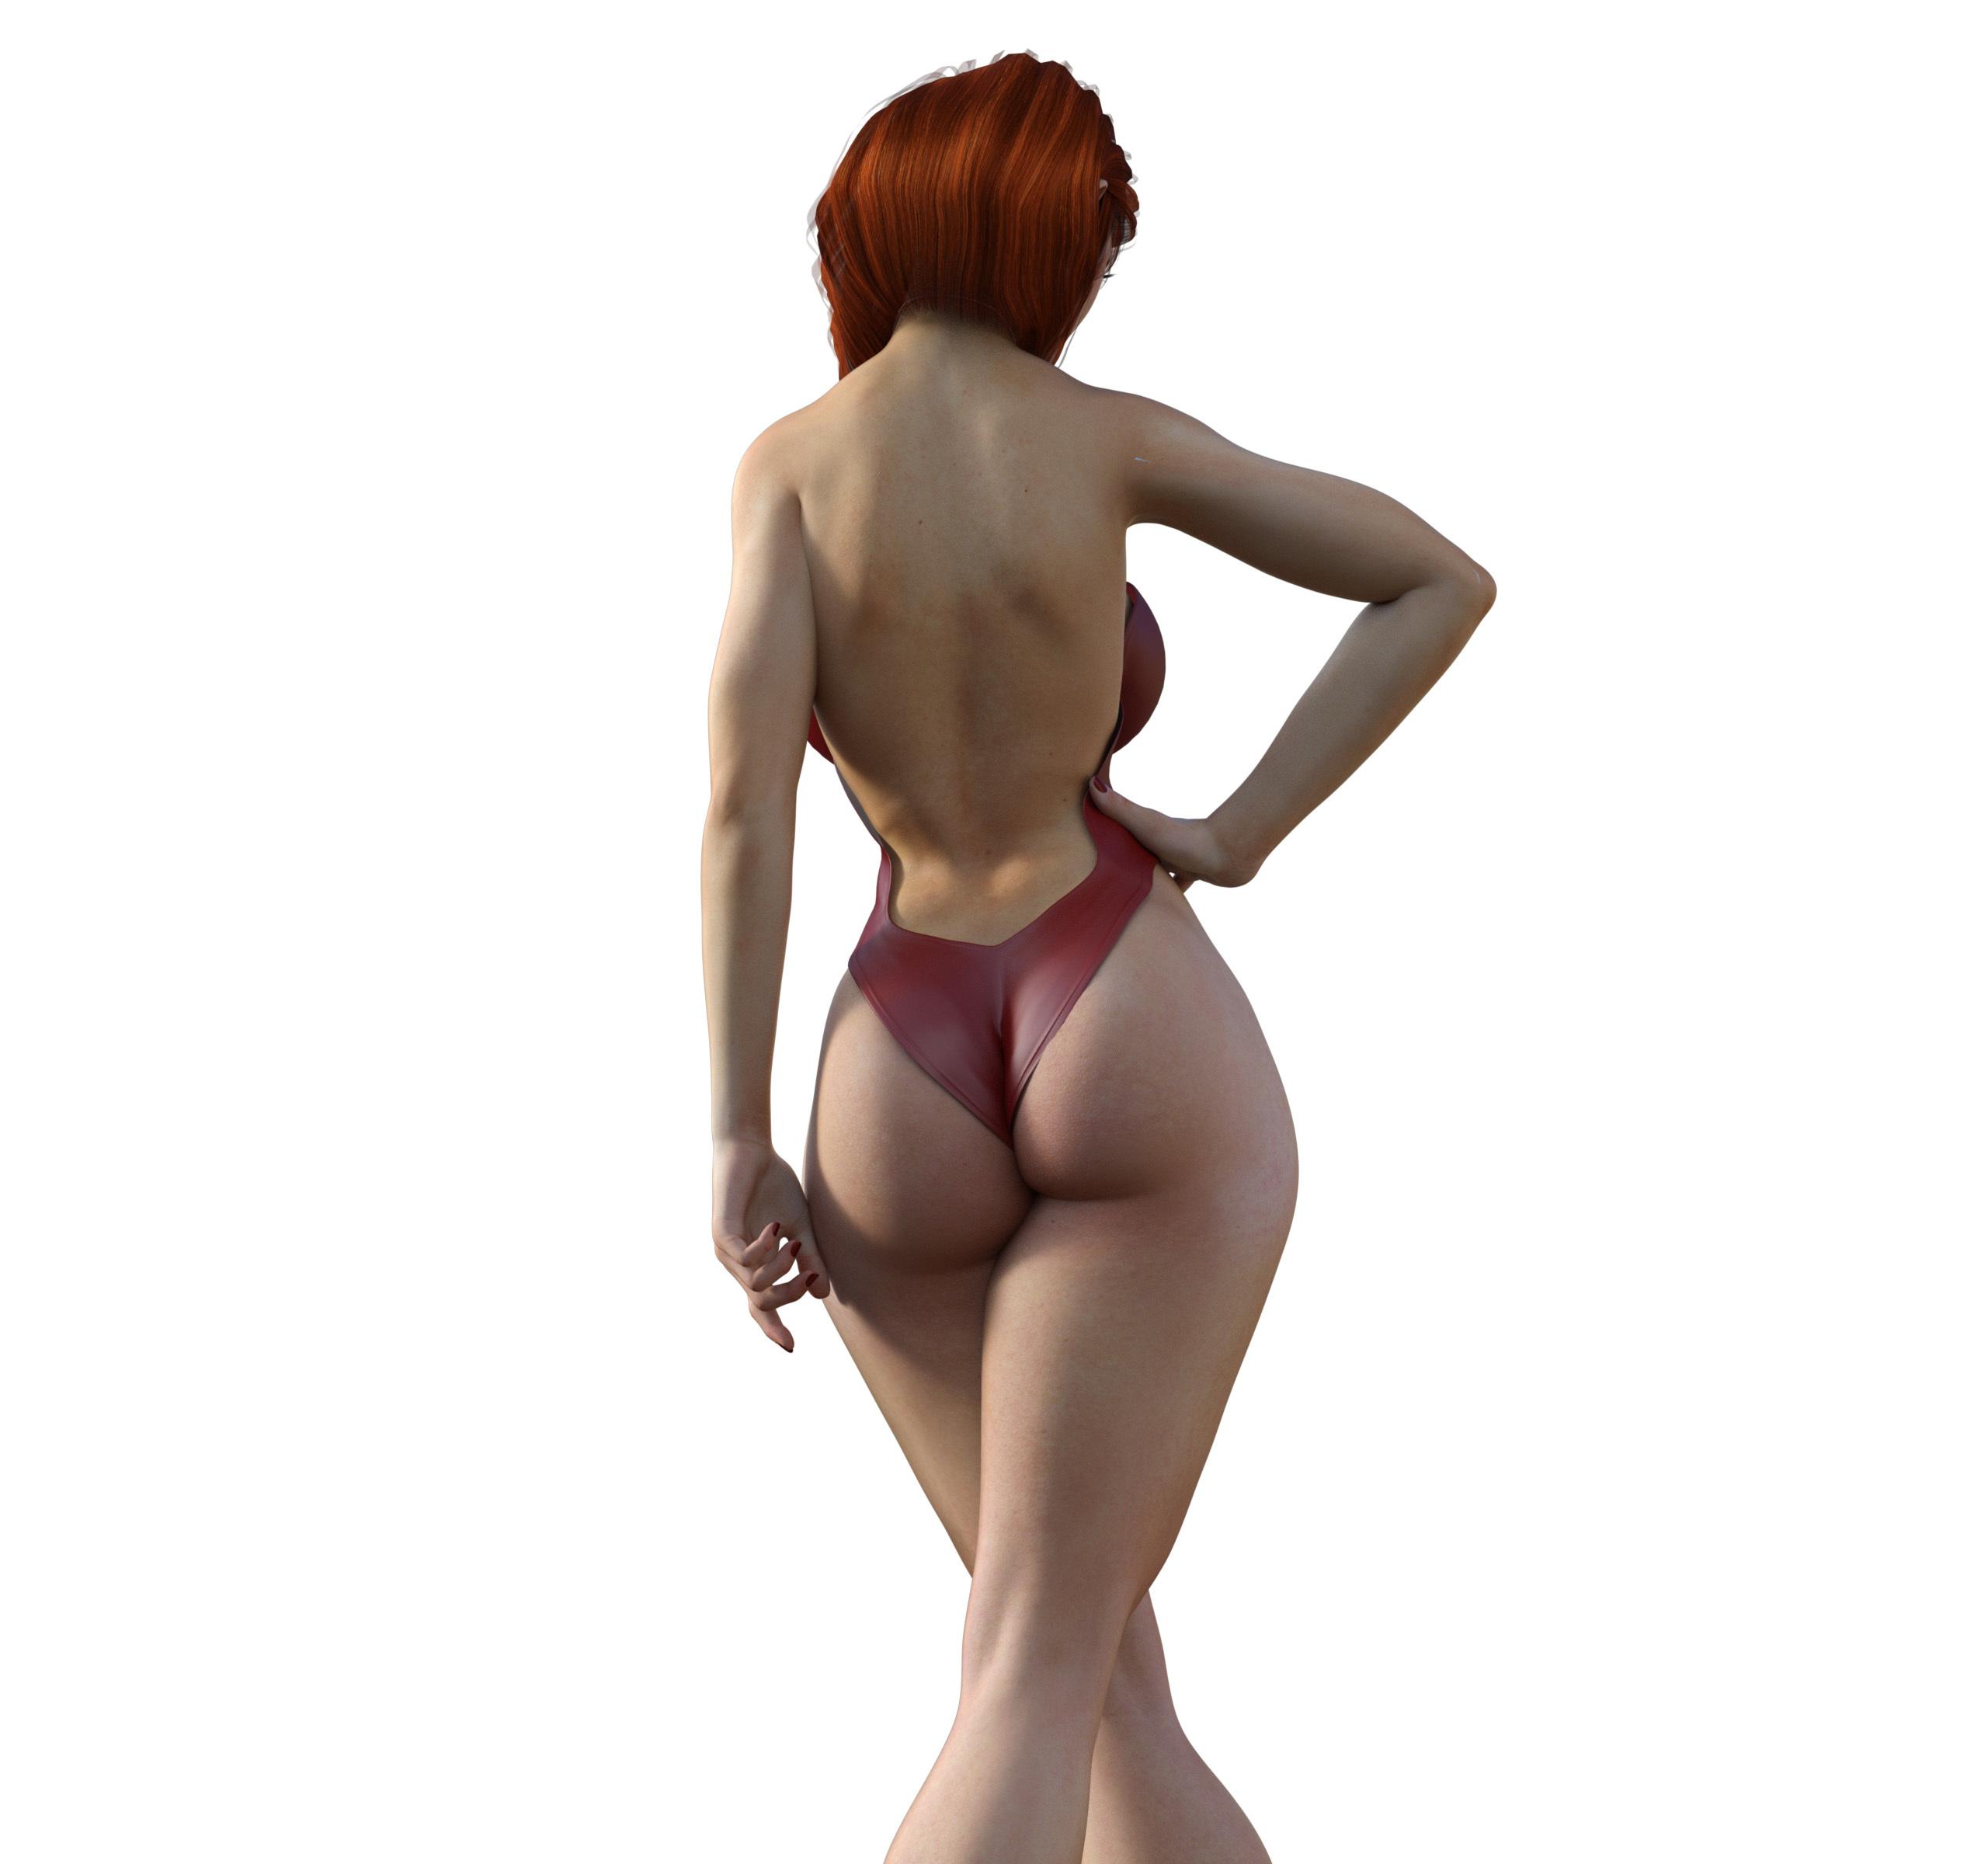 Alexa swimsuit try on